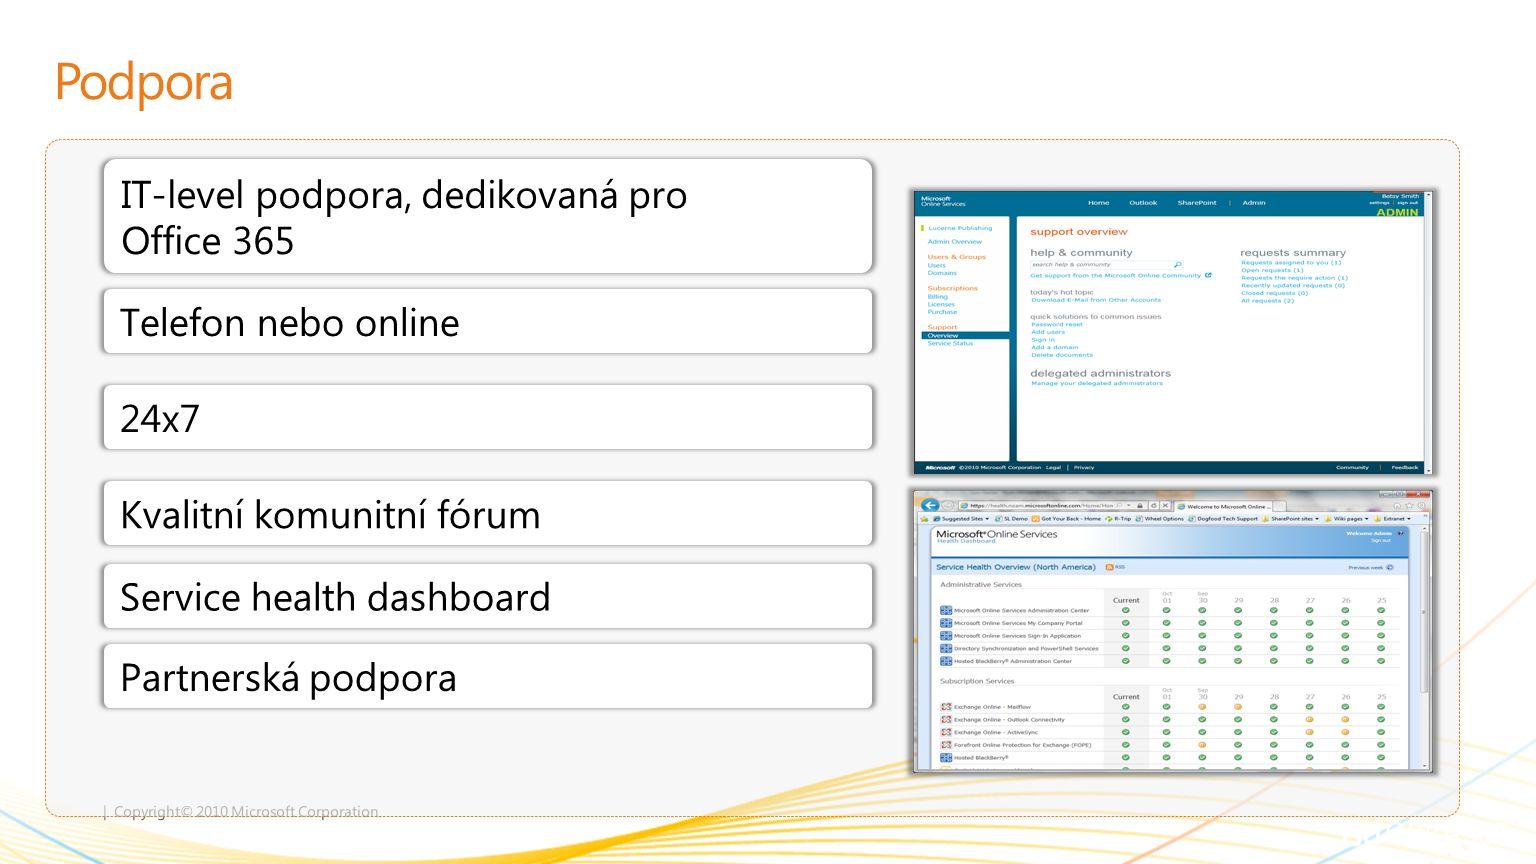 Podpora IT-level podpora, dedikovaná pro Office 365